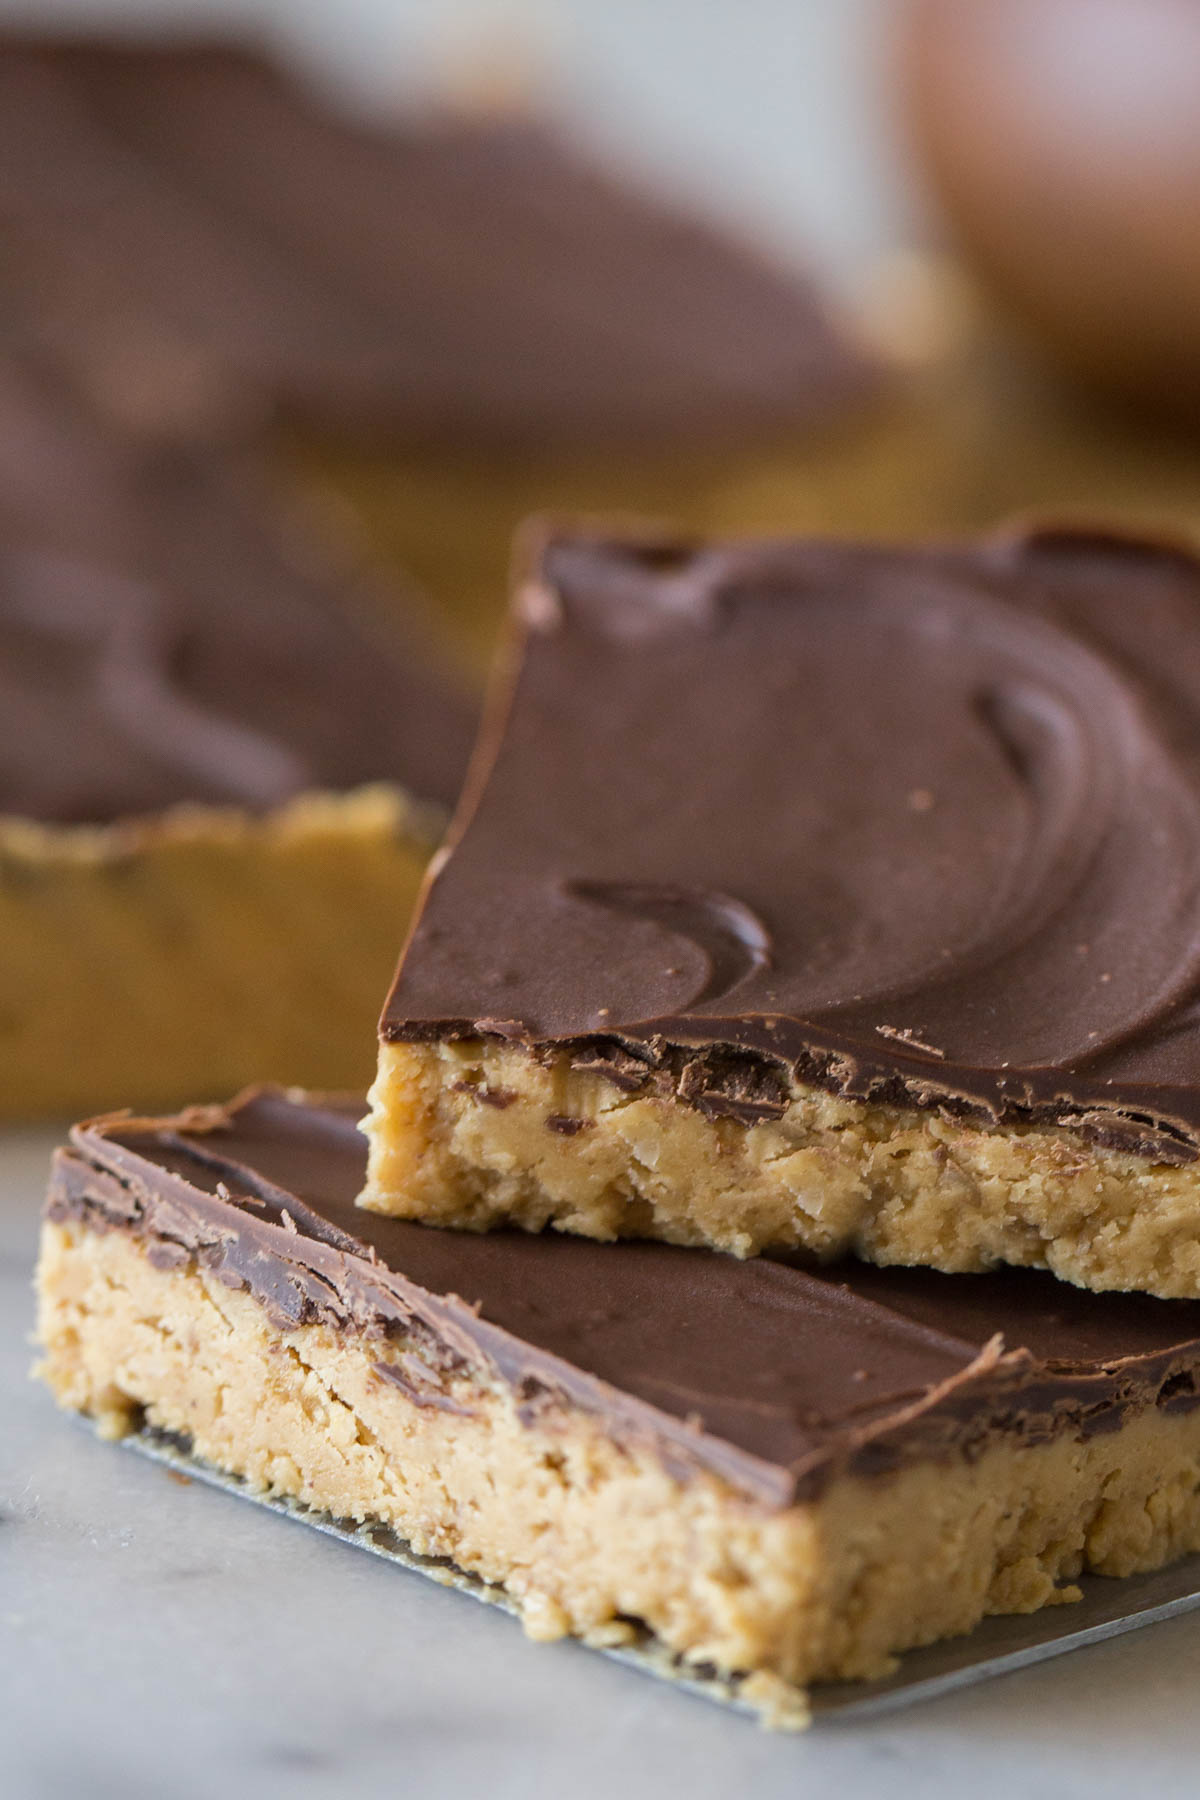 Close up shot of cut bar of Chocolate Peanut Butter Bar.